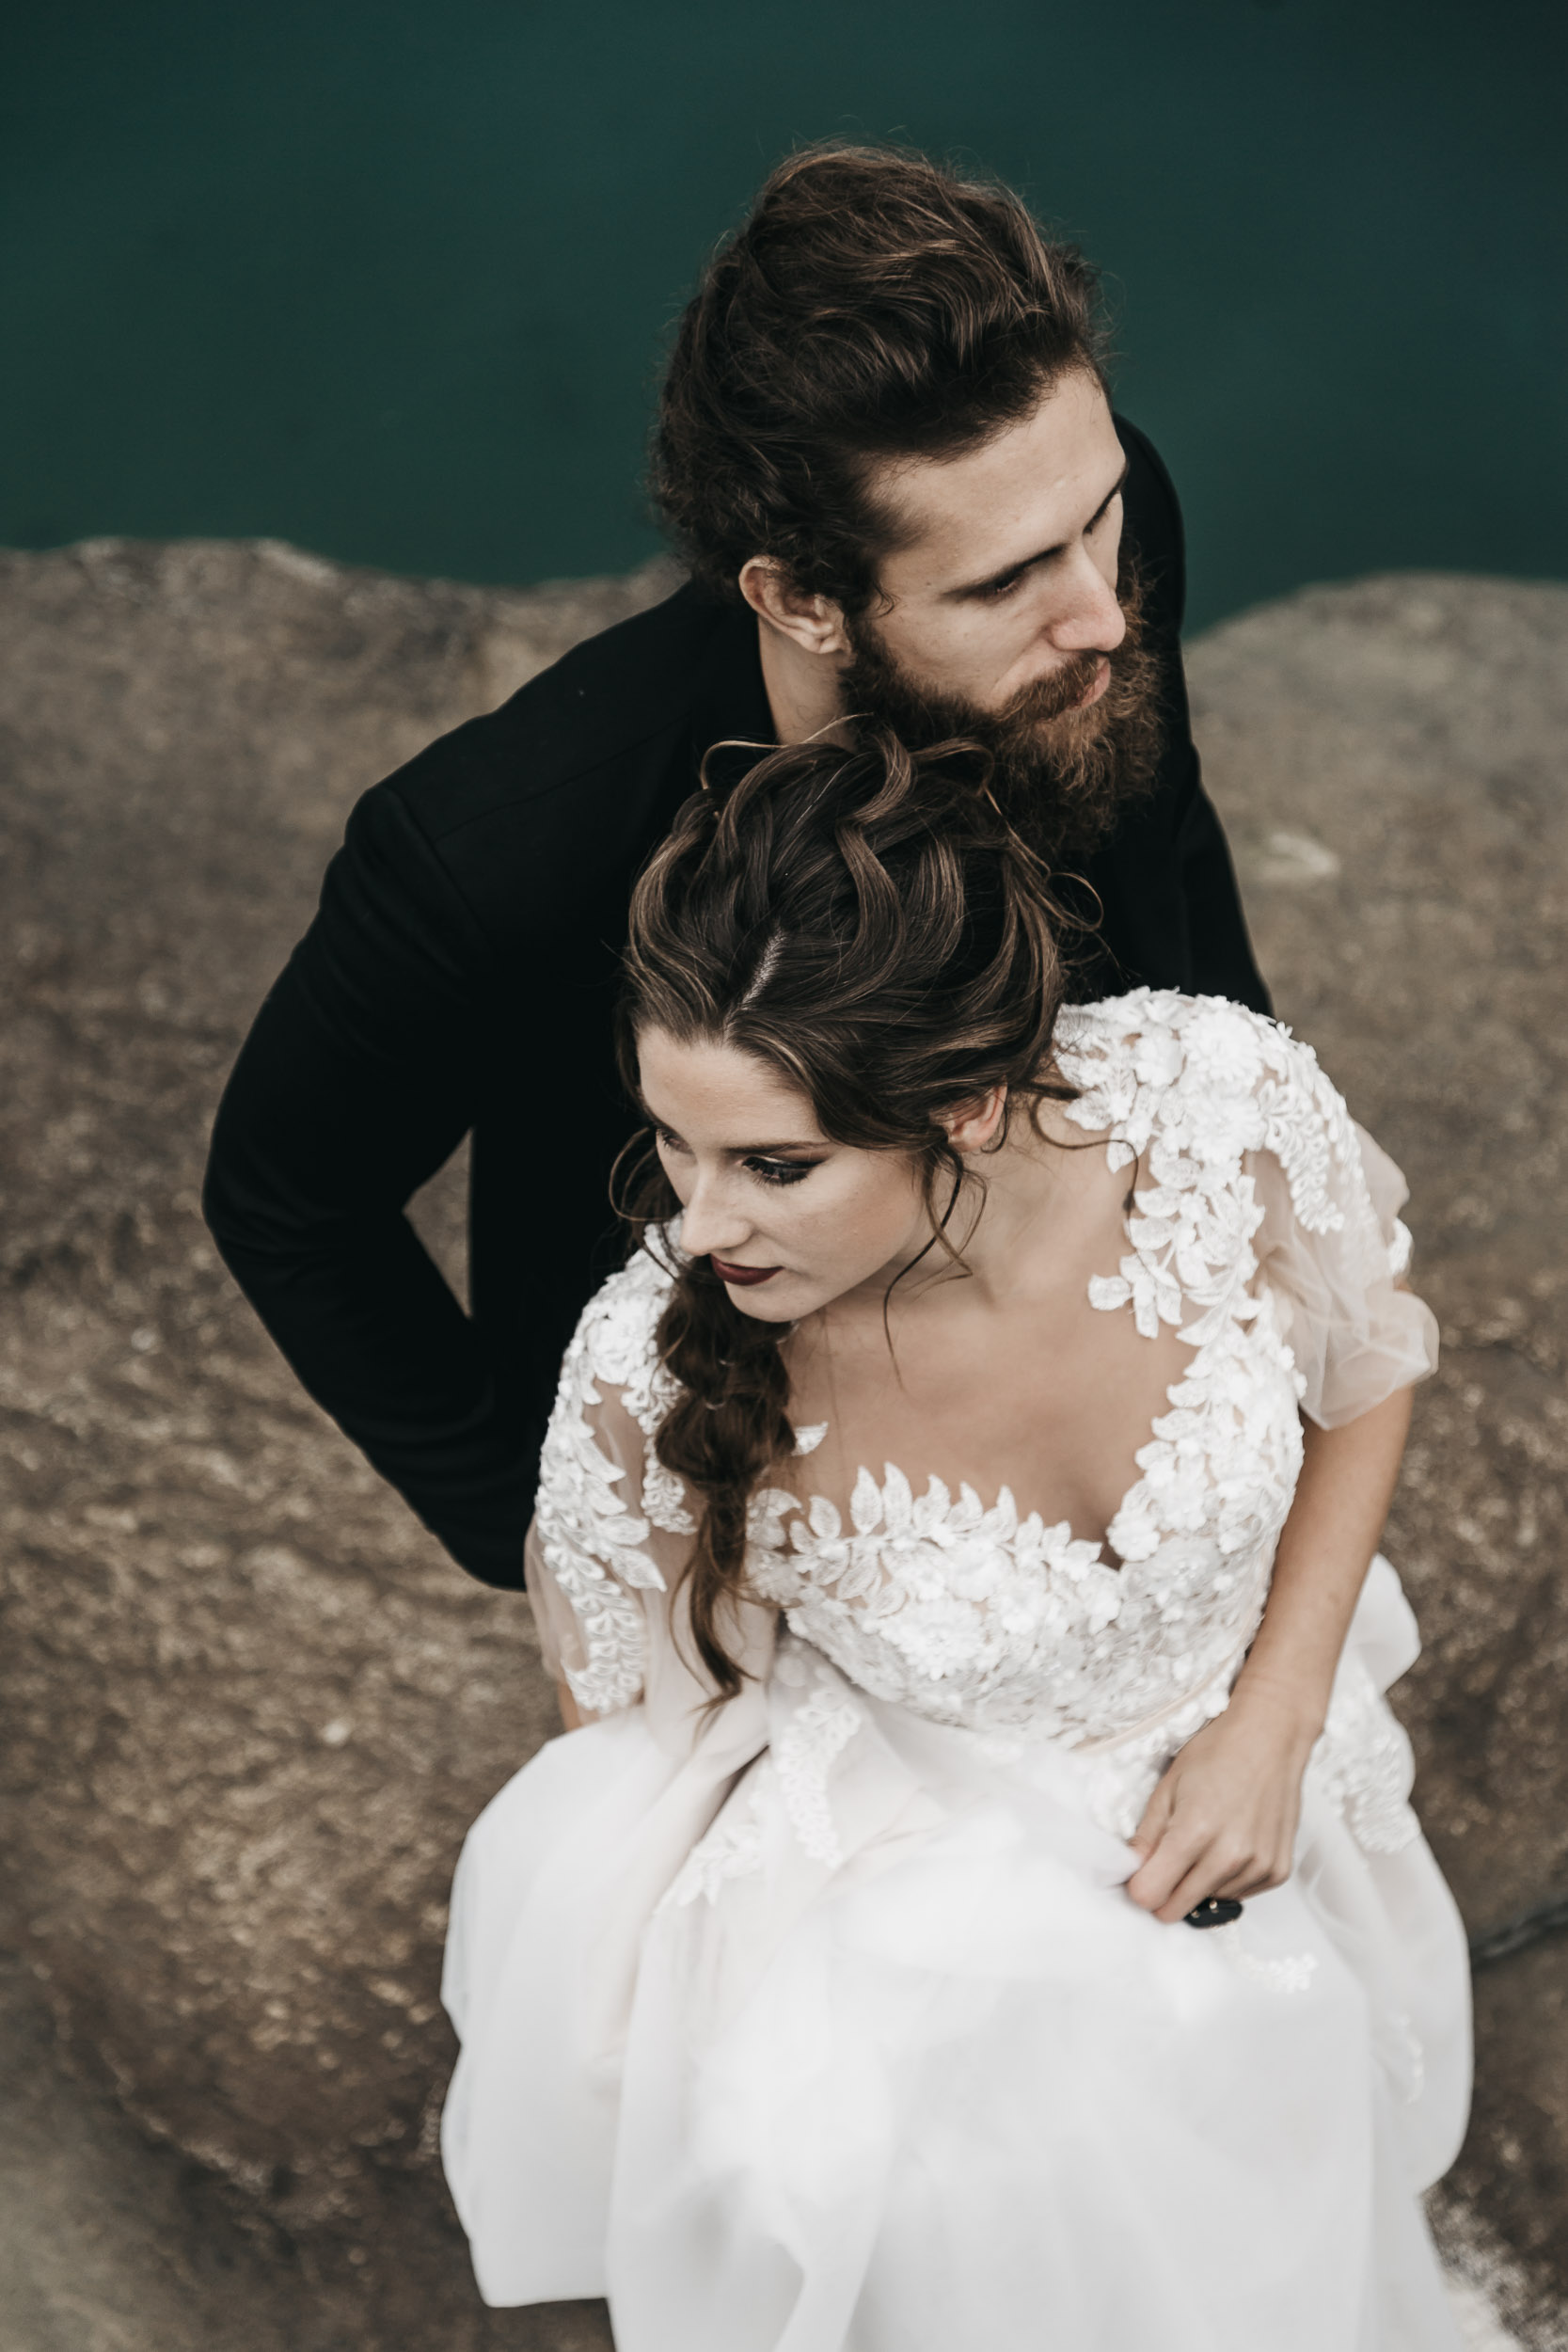 intimate-wedding-elopement-photographer-ottawa-toronto-0343.jpg